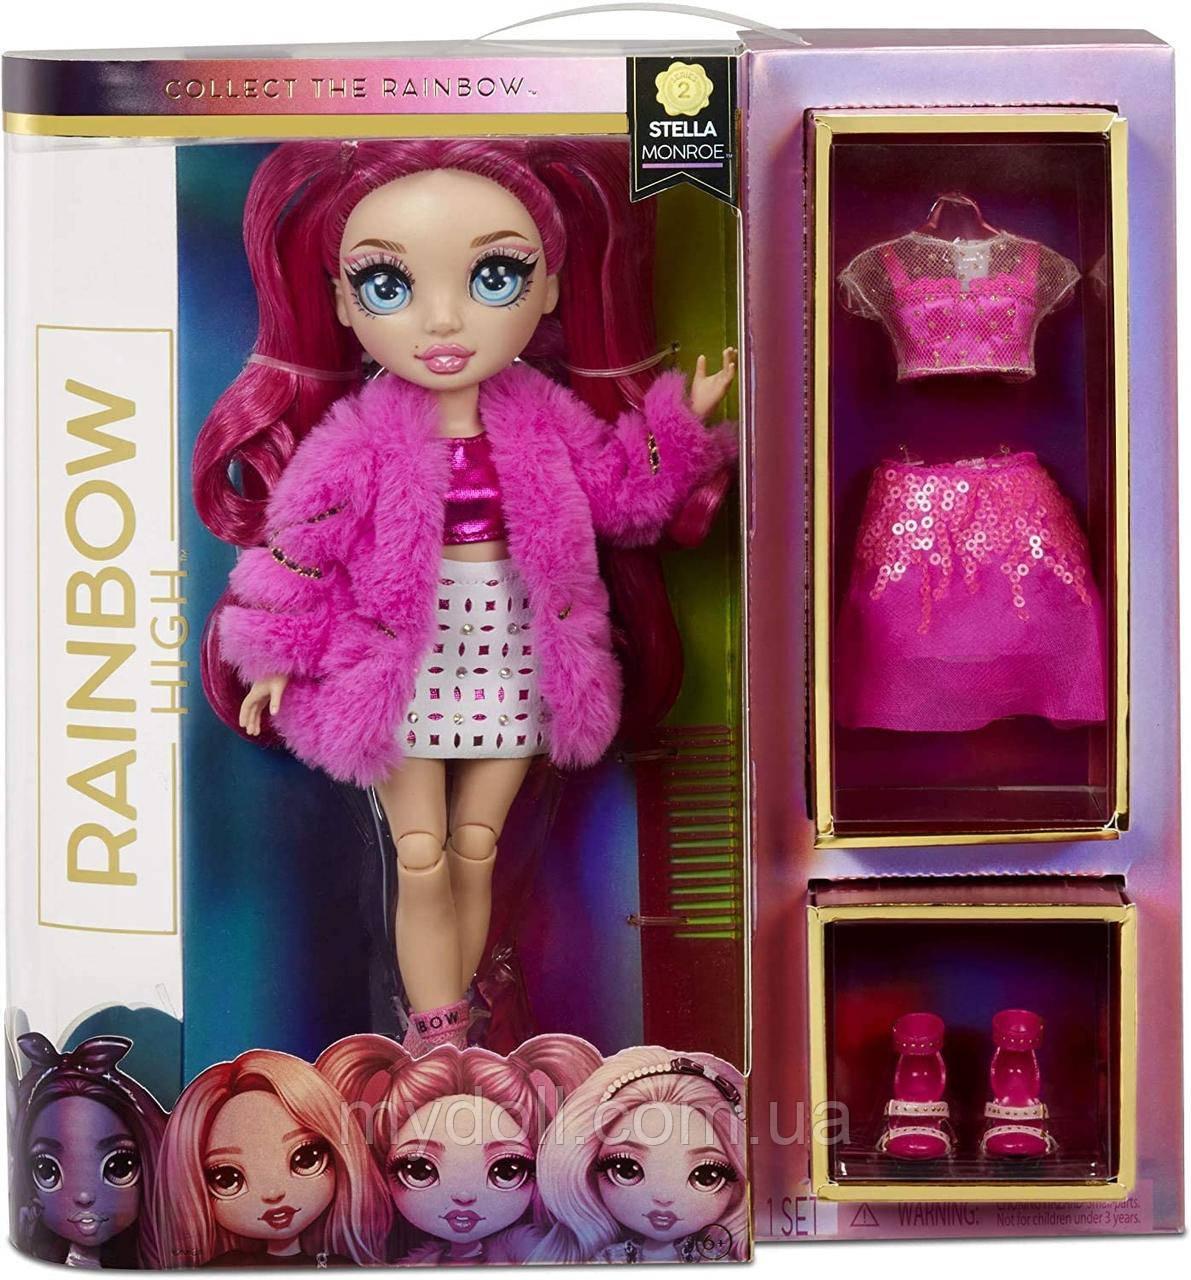 Уценка! Кукла Рейнбоу Хай Стелла Монро Фуксия Rainbow High S2 Stella Monroe Fuchsia Fashion Doll 572121